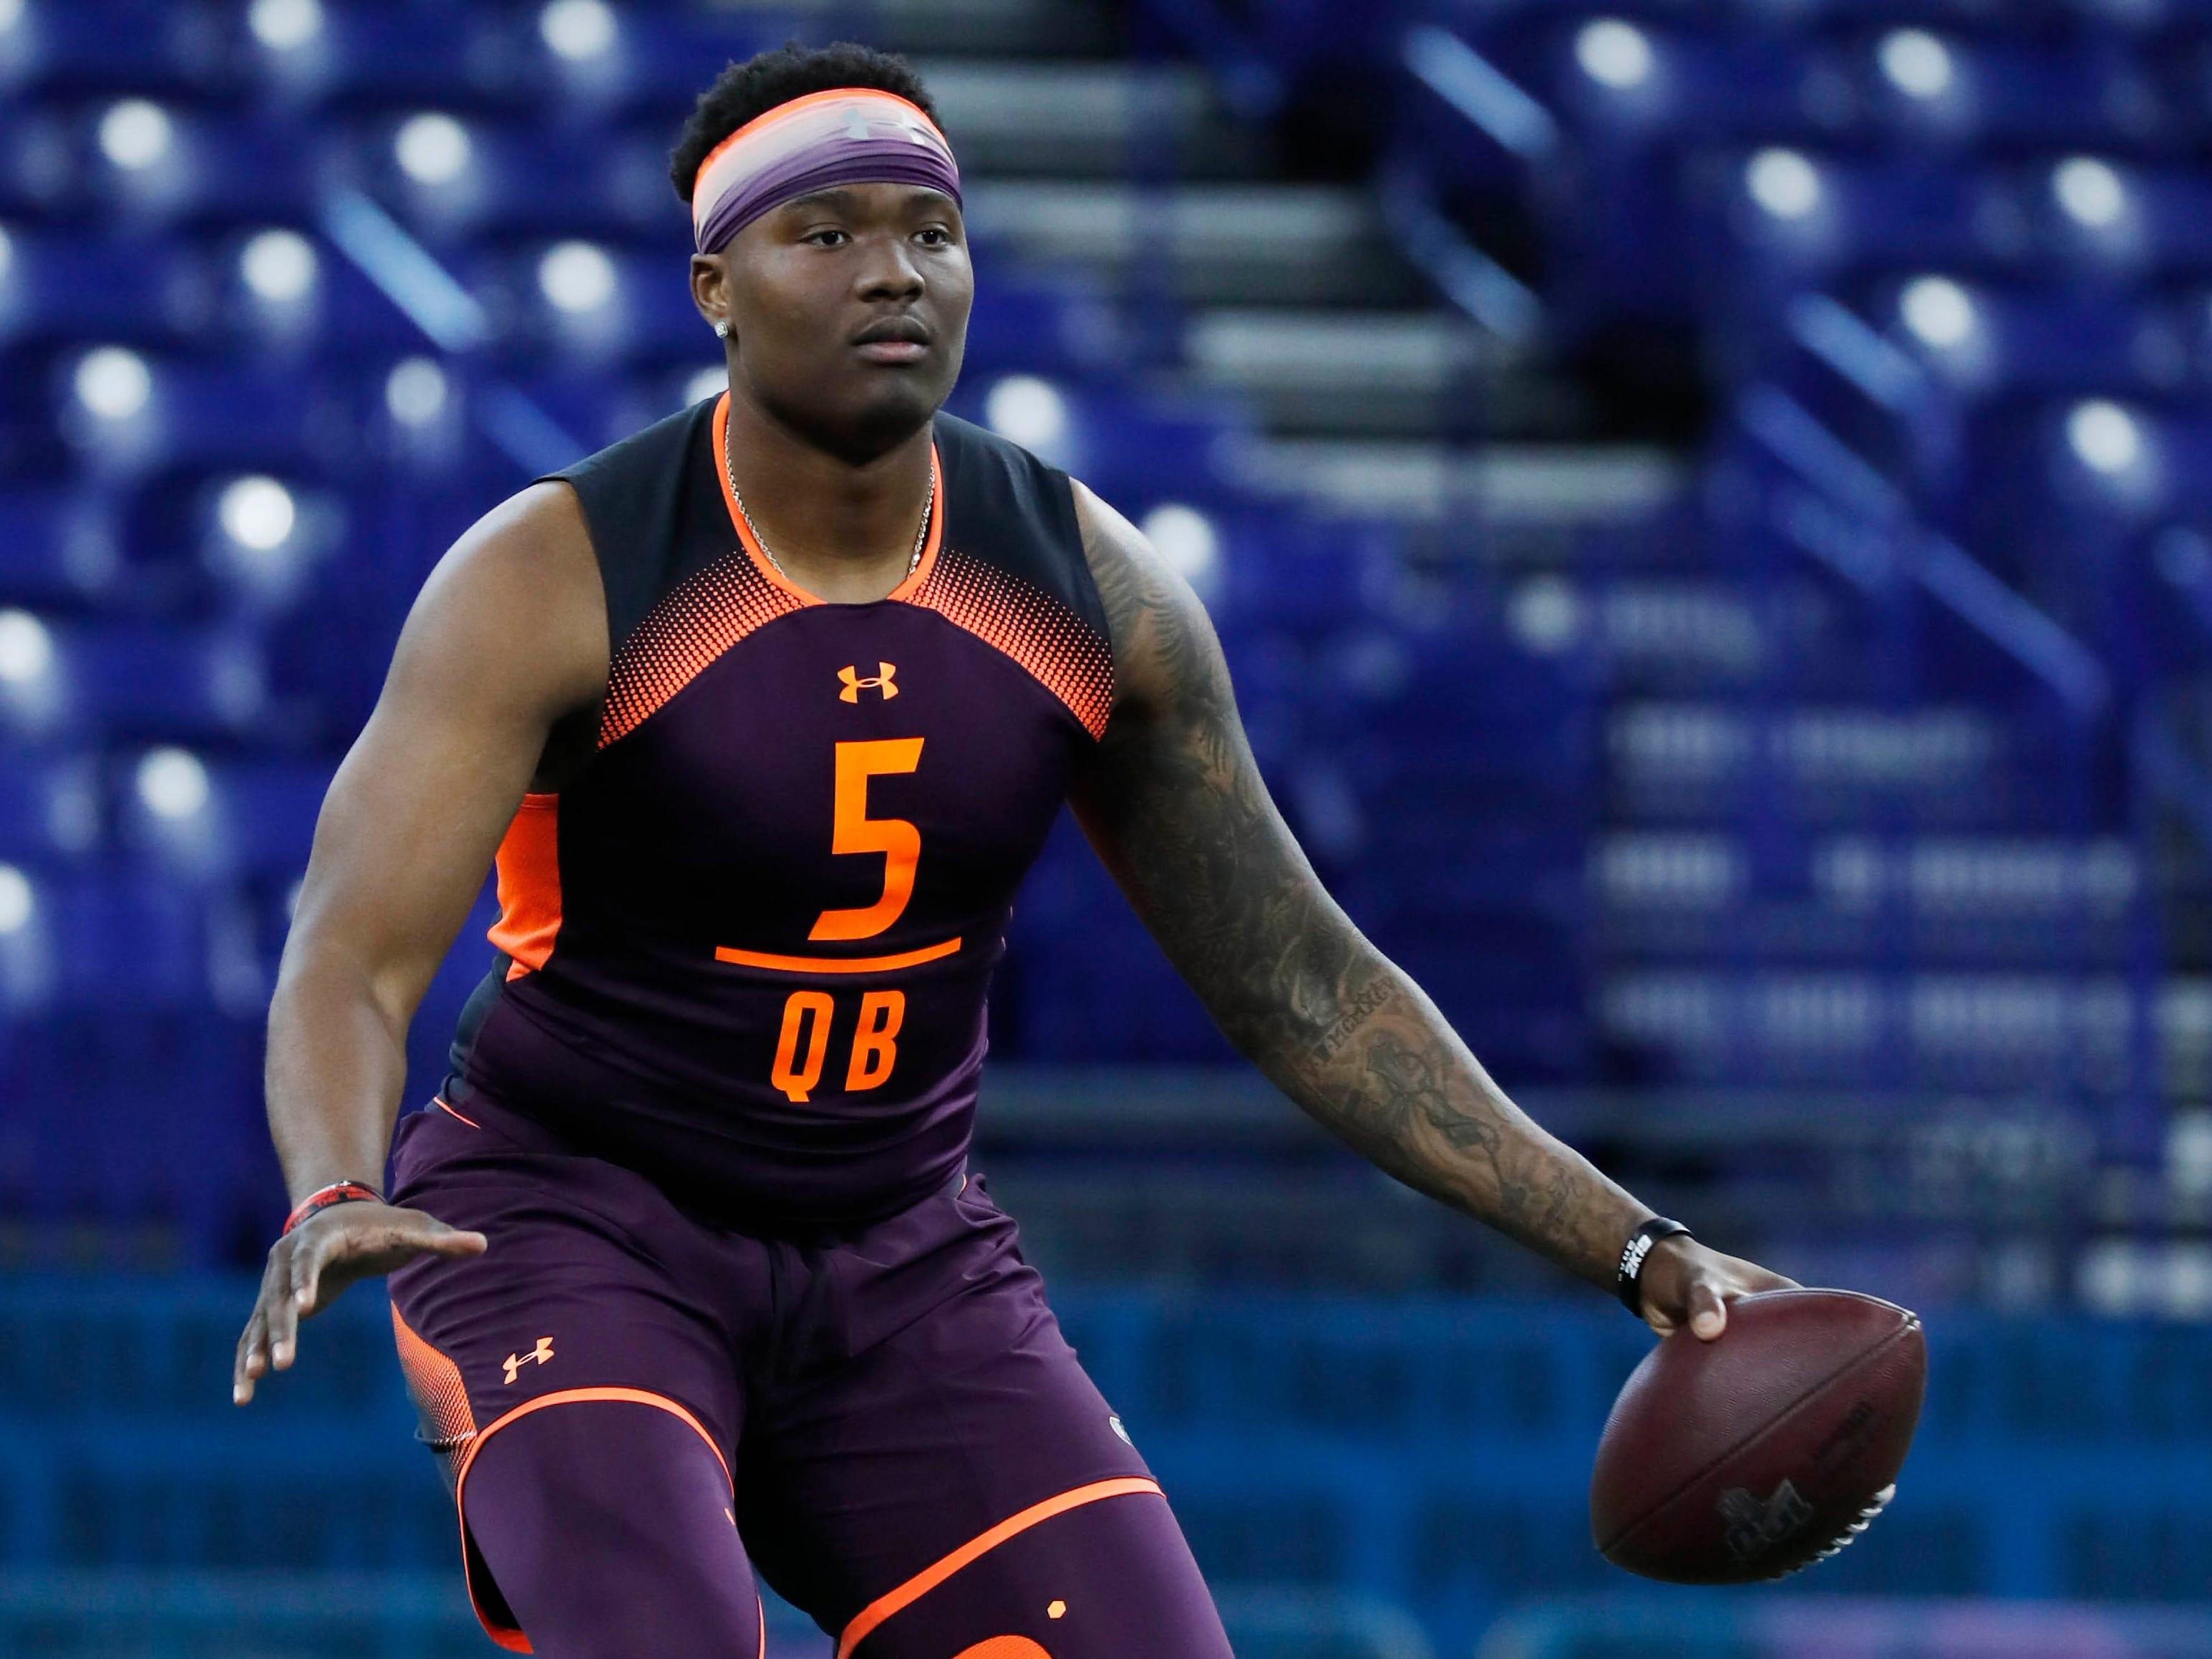 6. Giants — Dwayne Haskins, QB, Ohio State